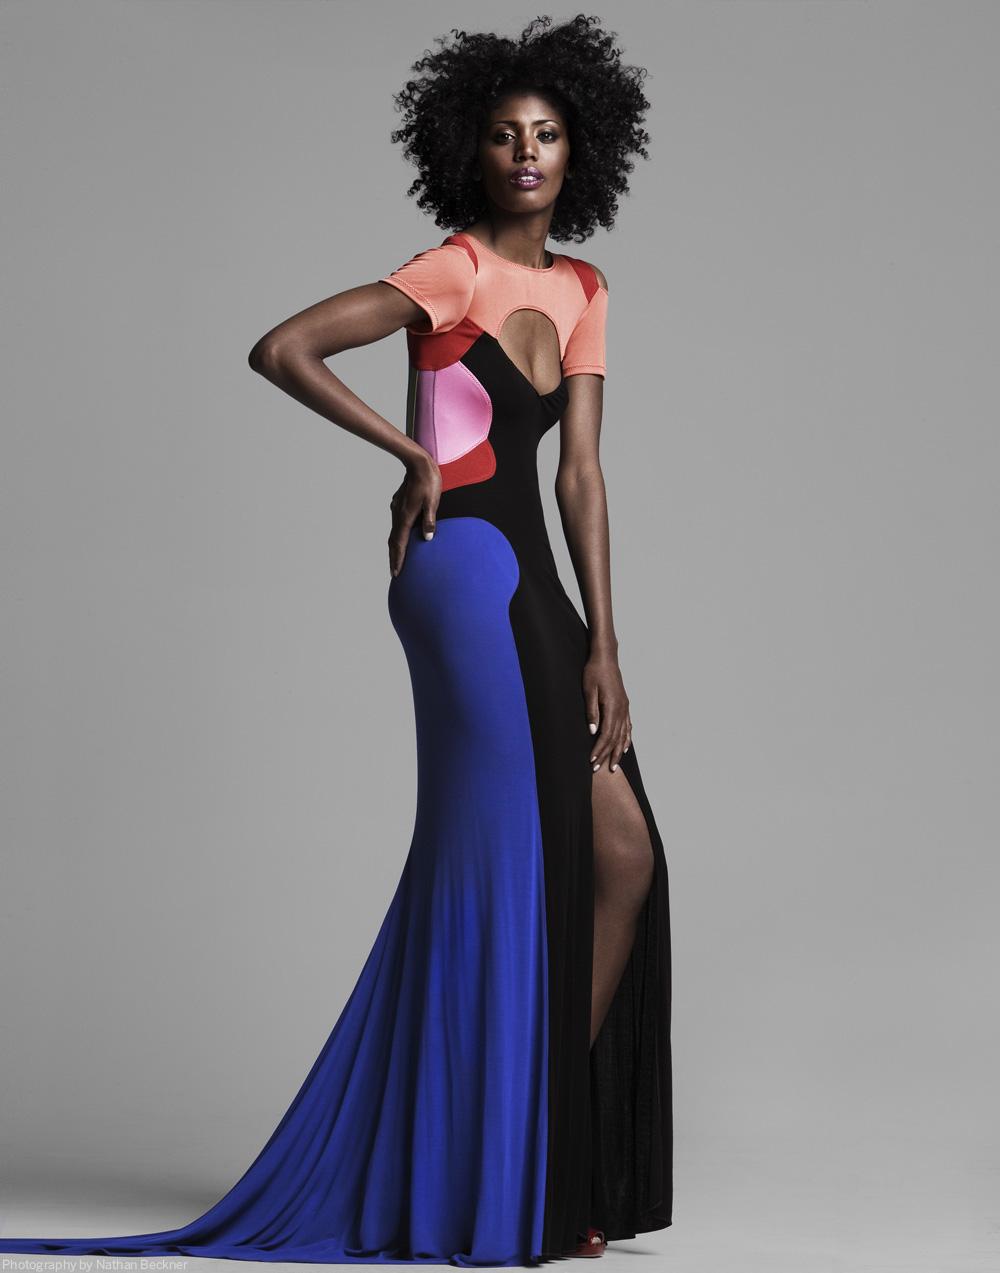 African American Fashion Shows | Fashion Sensei